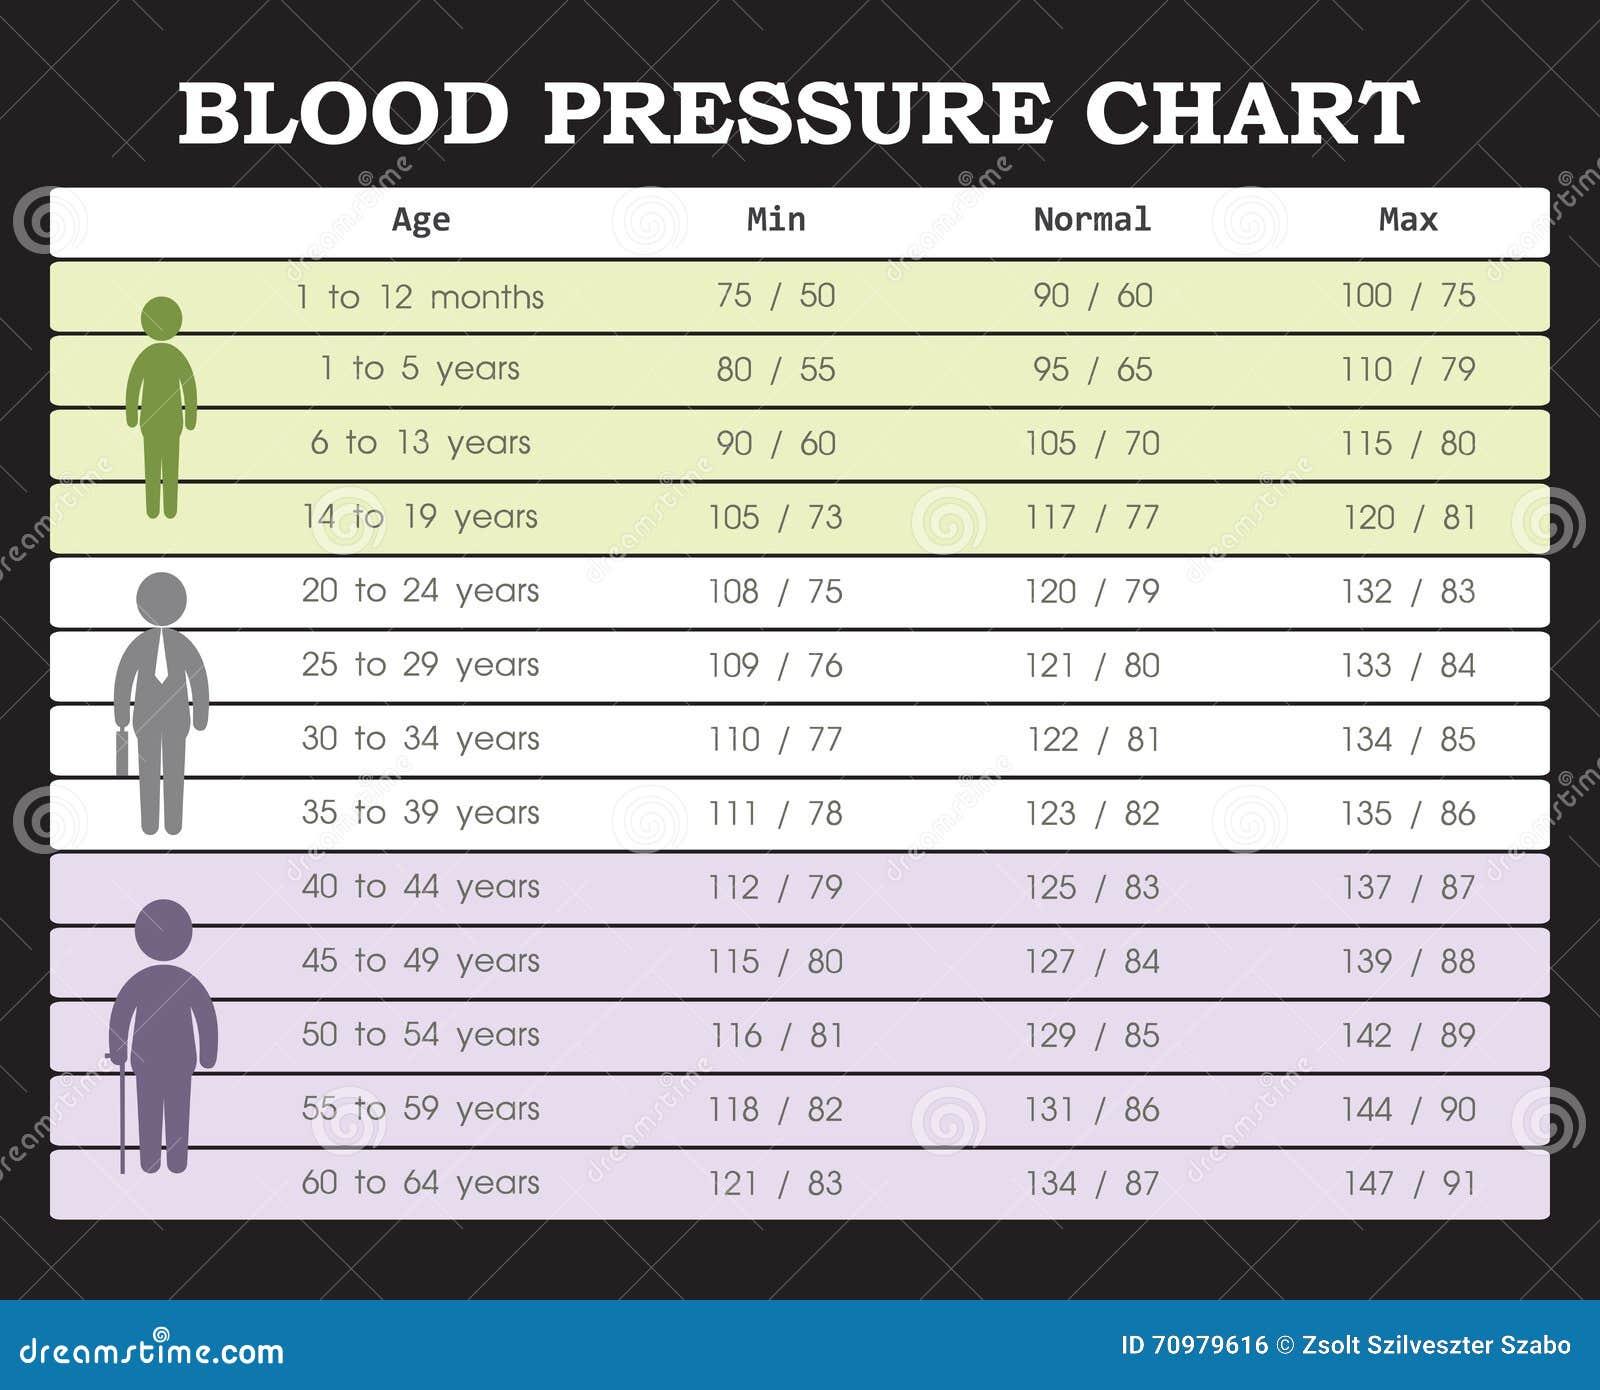 Download blood pressure chart fieldstation download blood pressure chart nvjuhfo Image collections